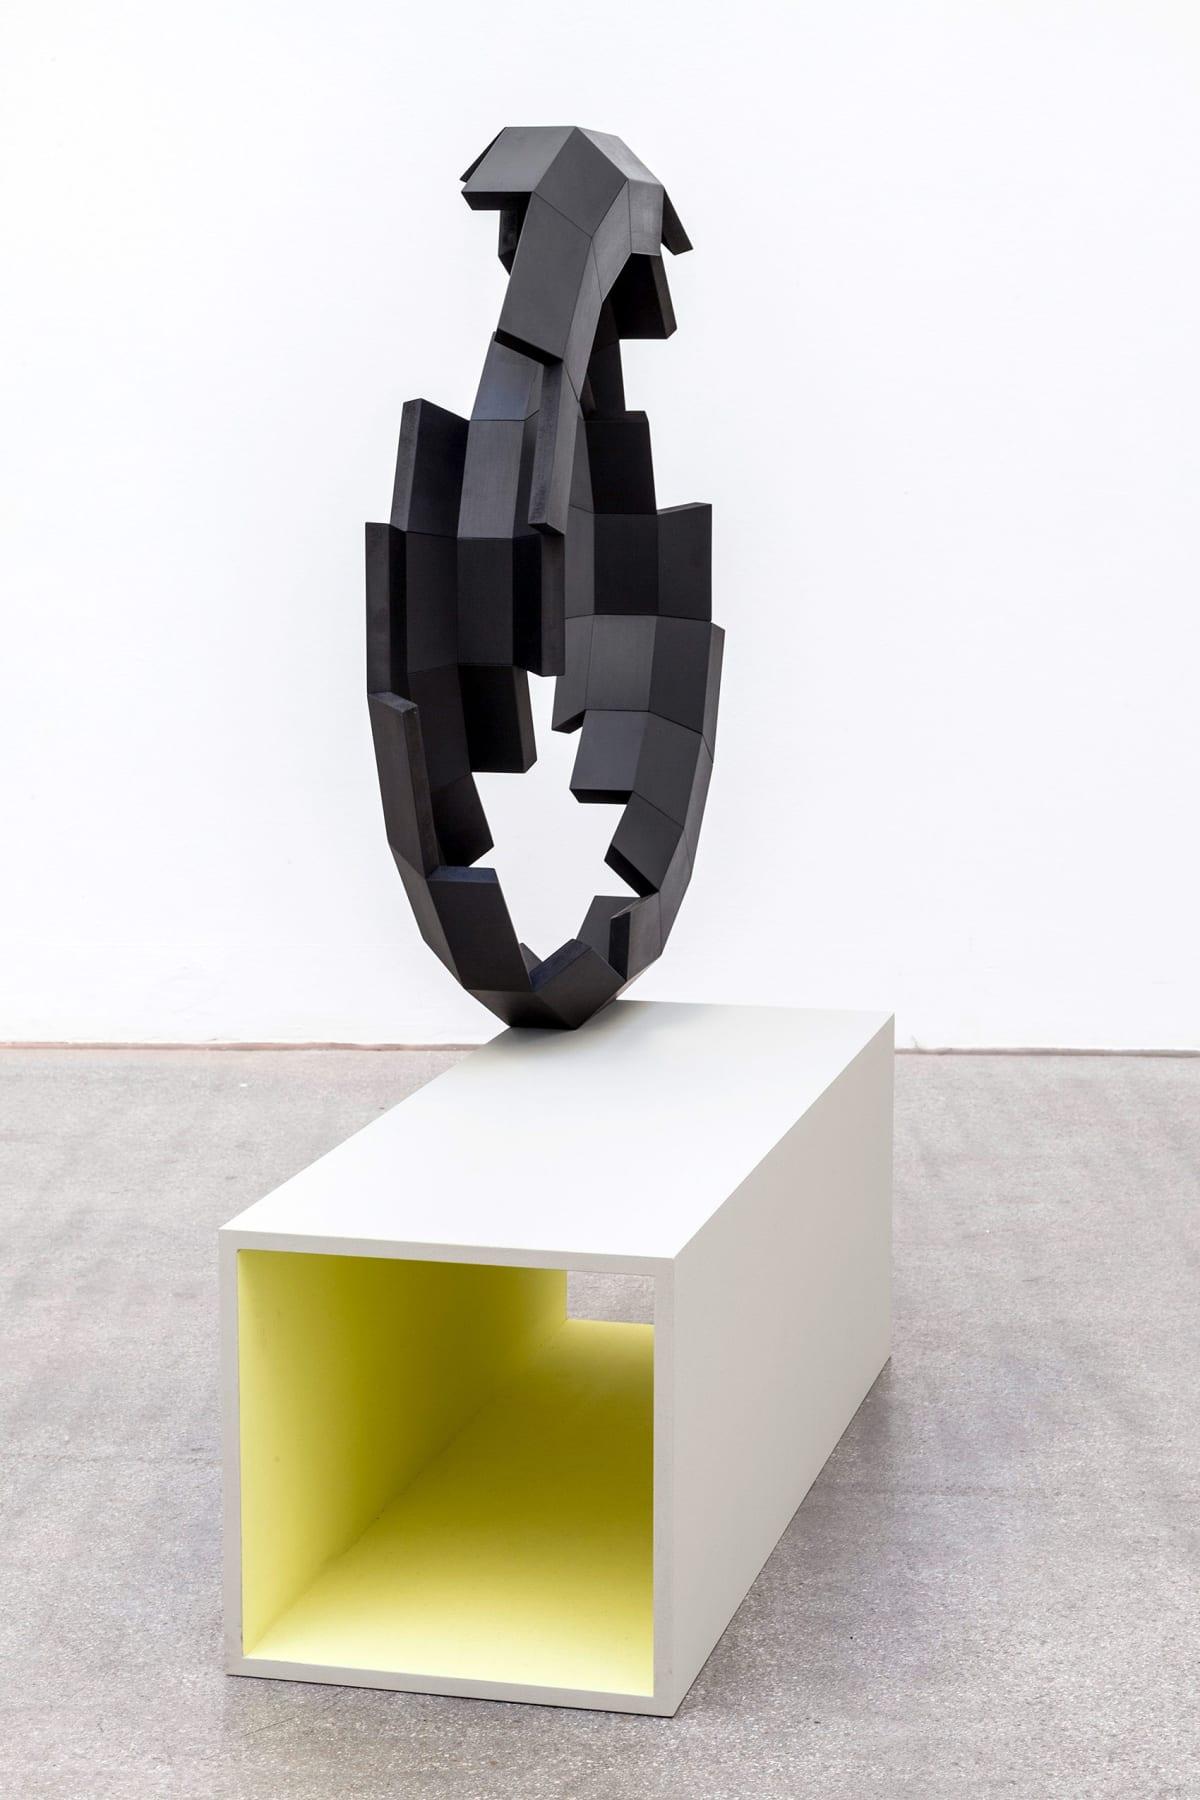 viewing room, art, munchies art club, shows a black sculpture on a white pedestal.